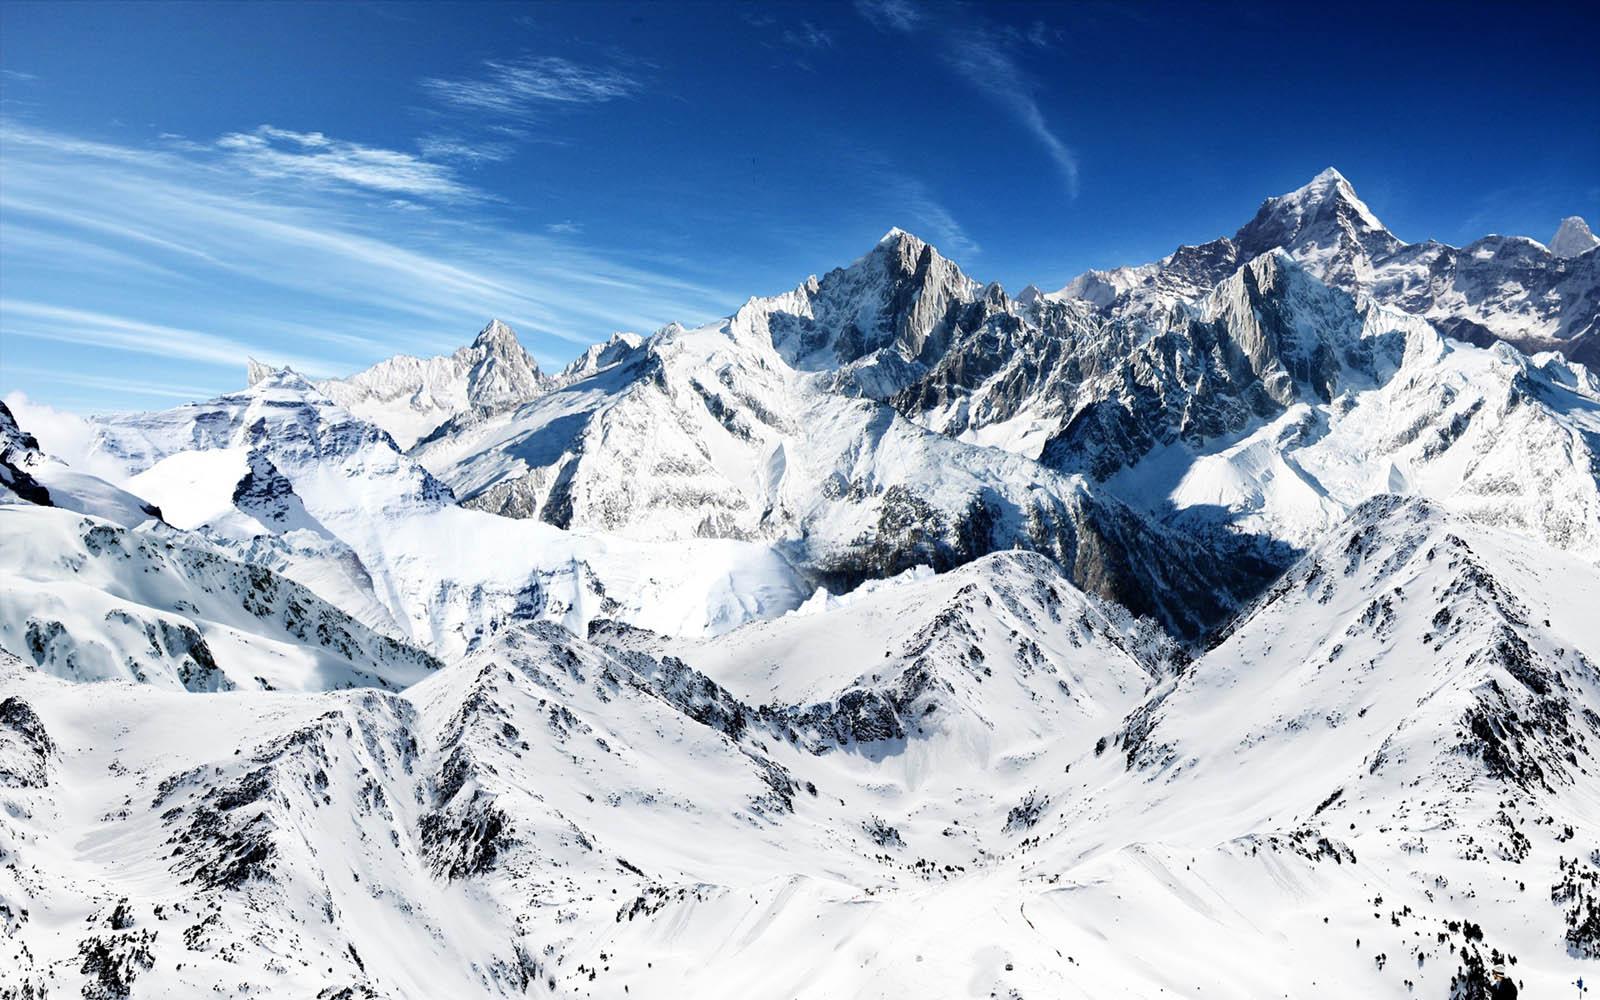 Snow Mountains Wallpapers Desktop Wallpaper 1600x1000